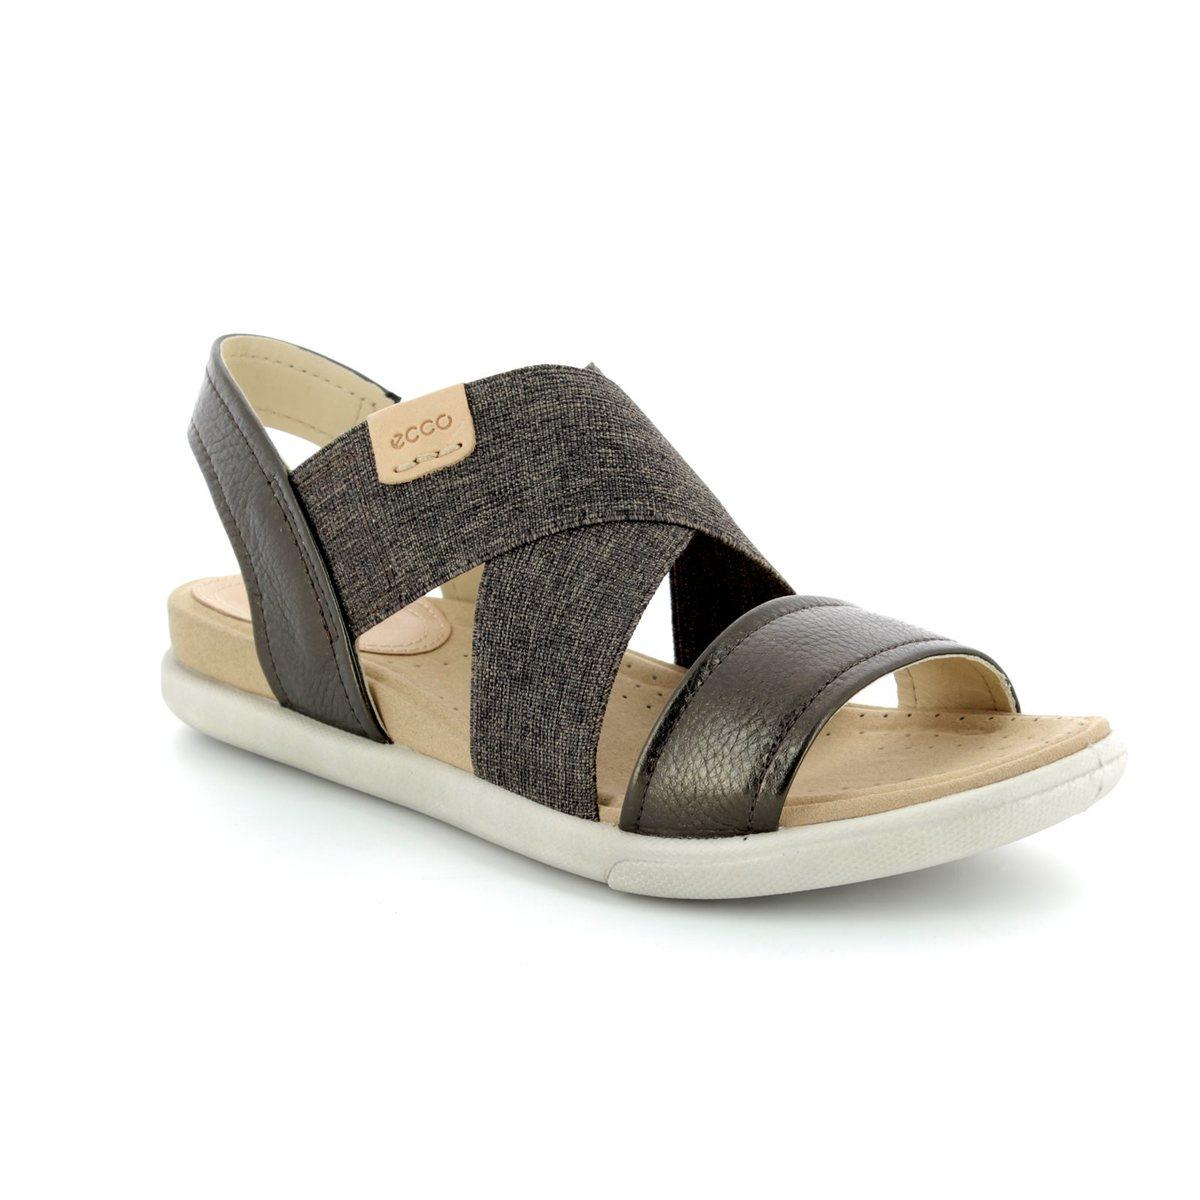 645ab700842f ECCO Sandals - Pewter - 248223 50533 DAMARA SANDAL